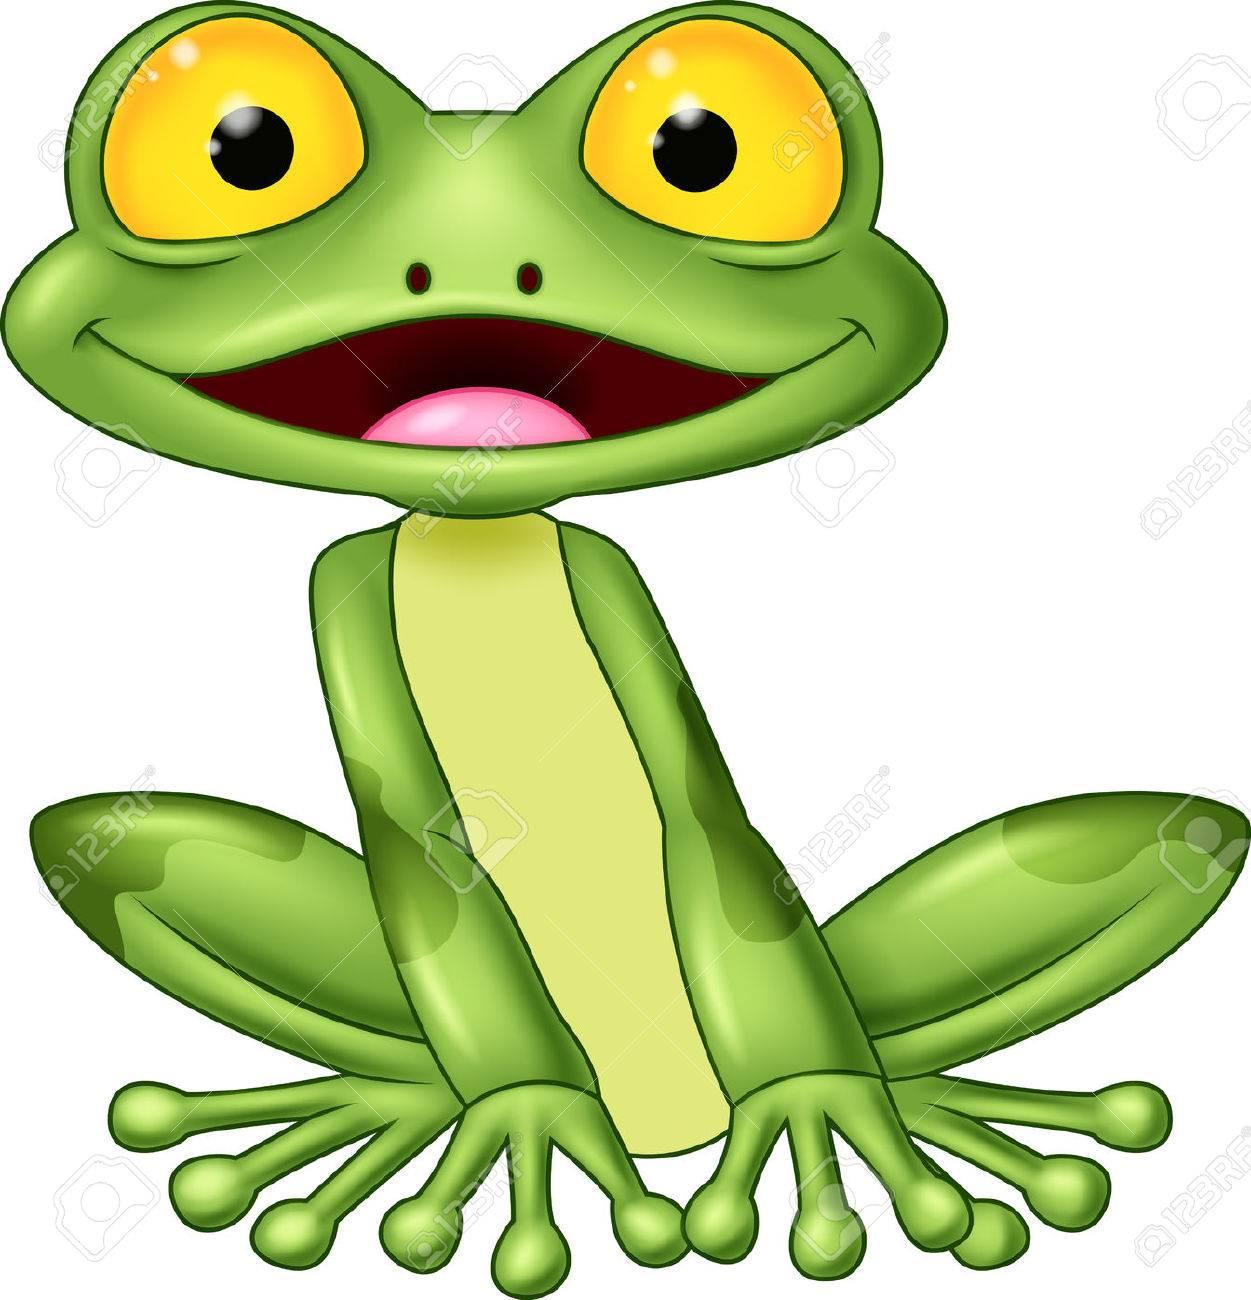 cartoon cute frog royalty free cliparts vectors and stock rh 123rf com